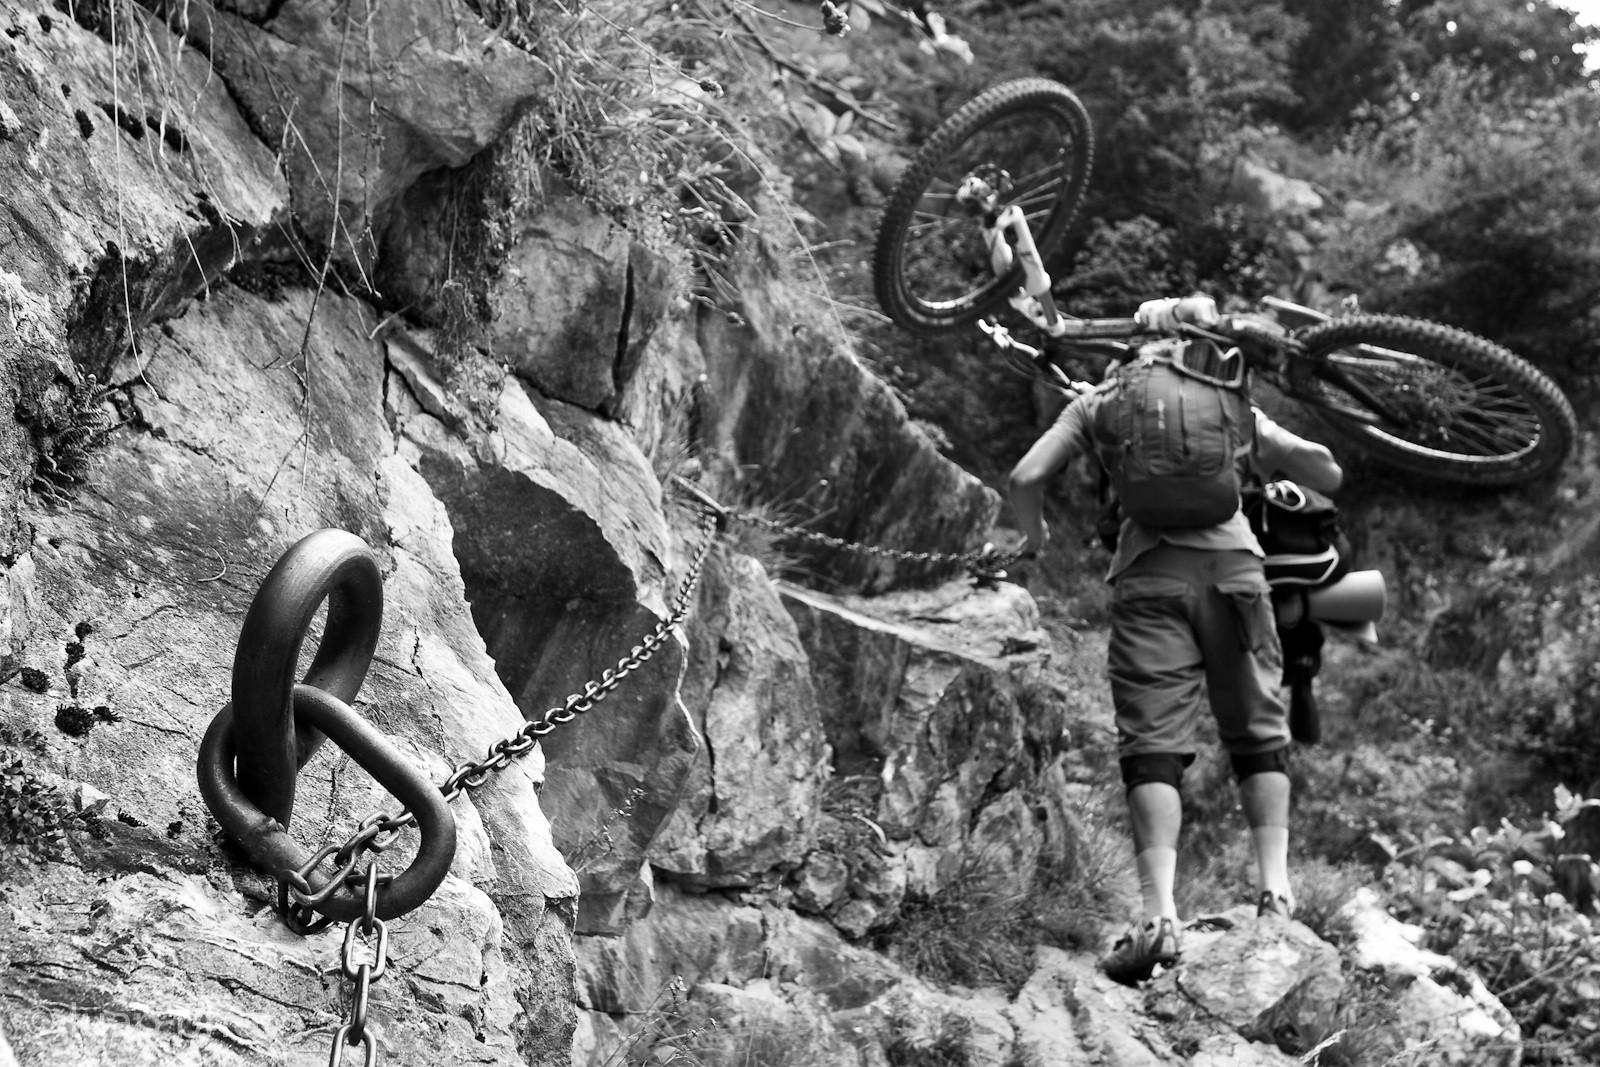 MANtainbiking-41-Edit - luapphoto - Mountain Biking Pictures - Vital MTB